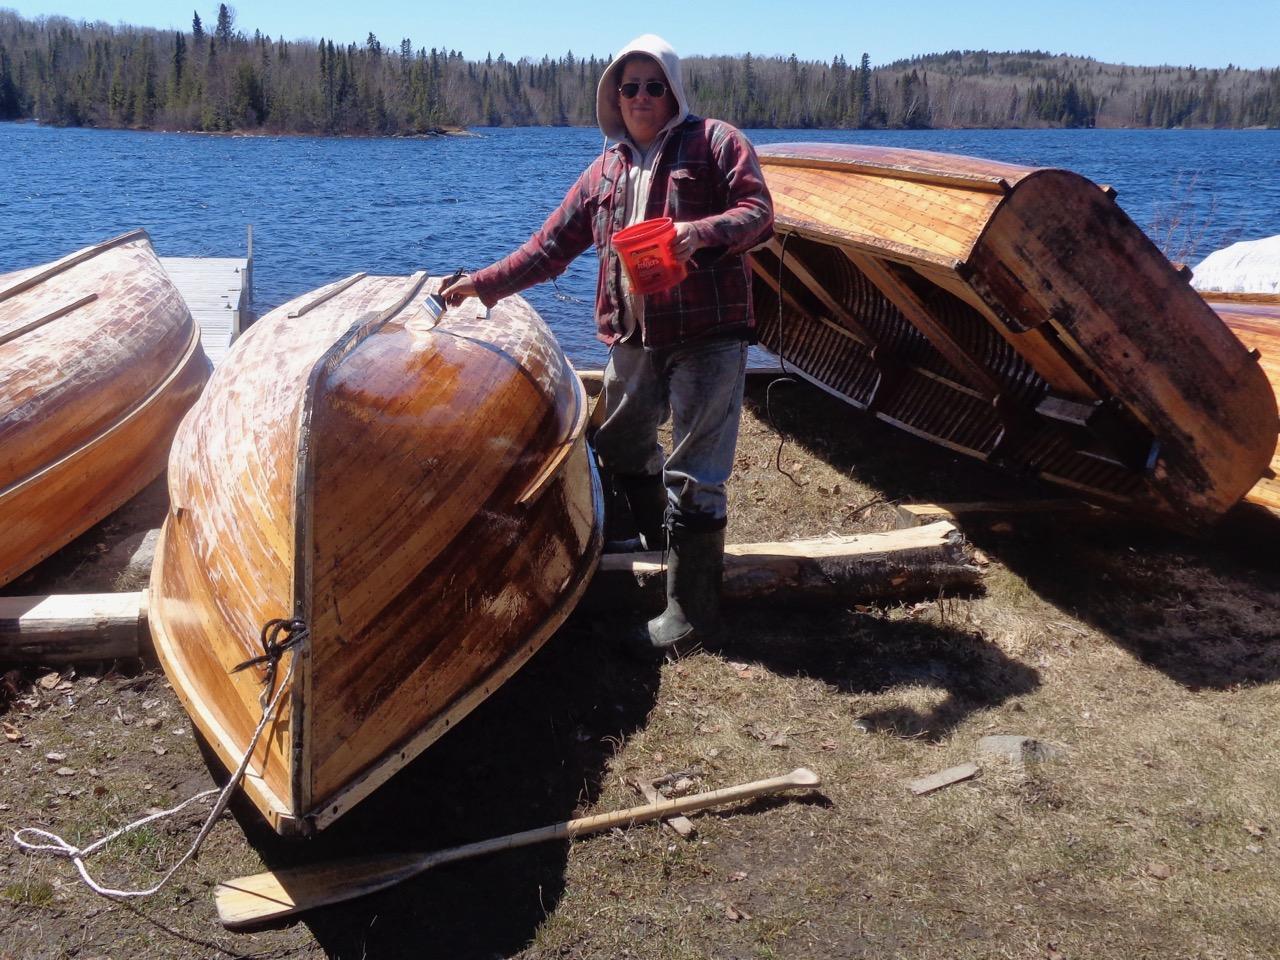 Loch island lodge ontario canada fishing trips autos post for Ontario canada fishing trips